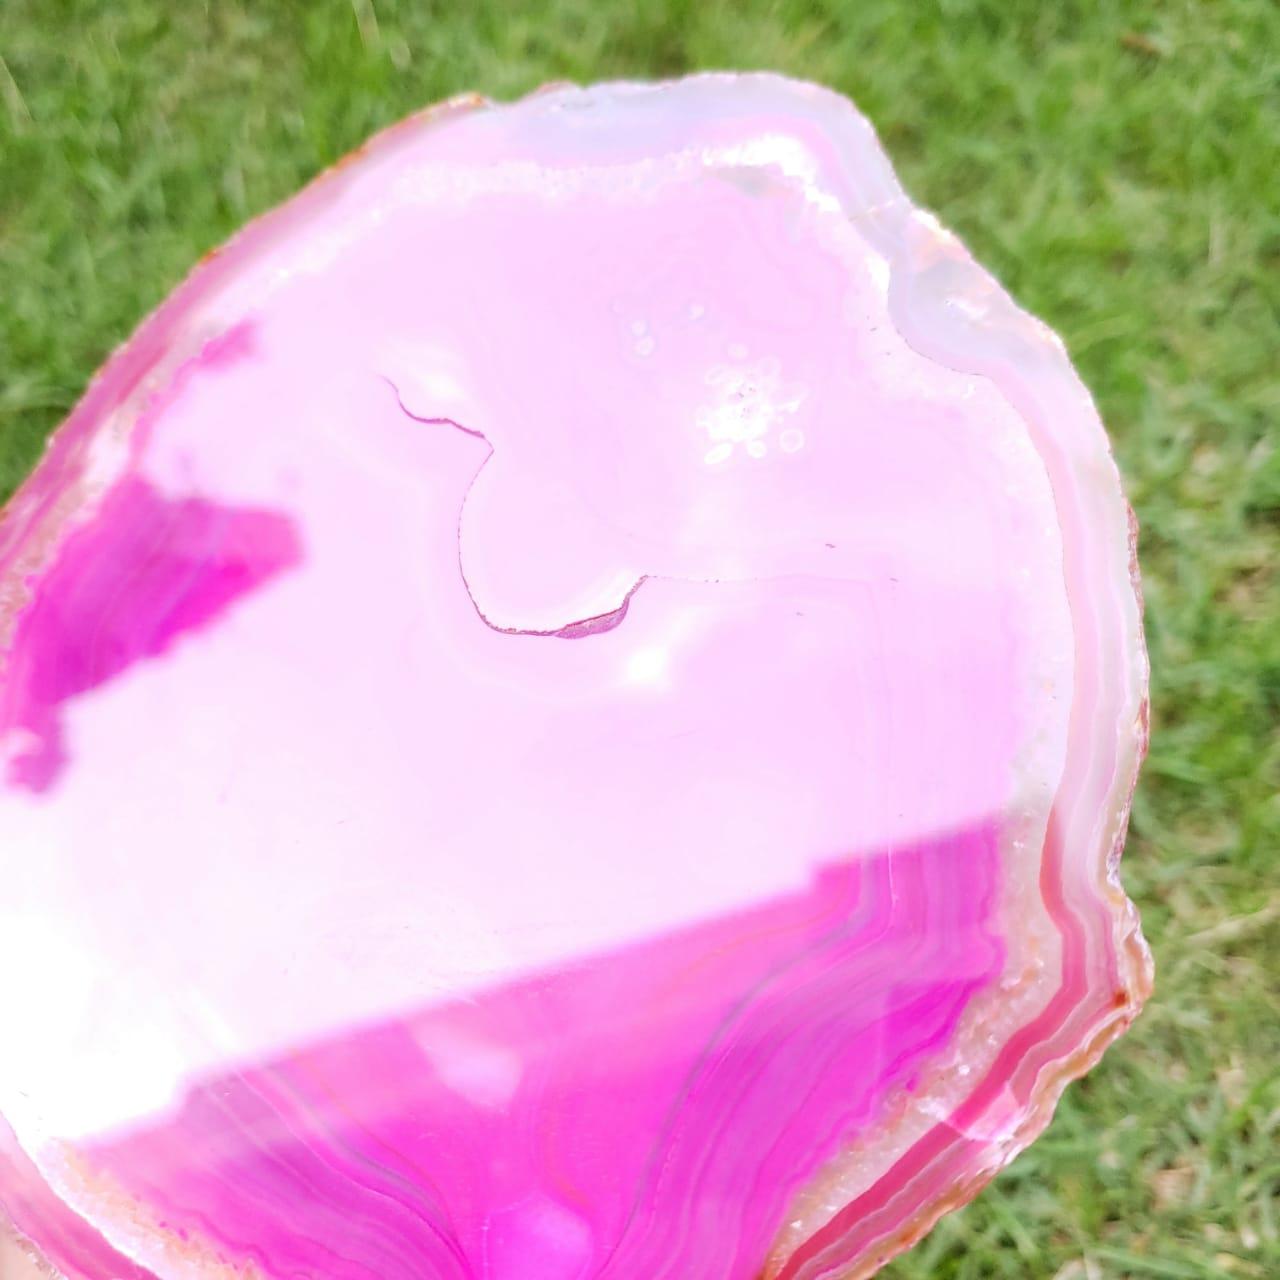 Cristal - Chapa - Placa Ágata Rosa - Com Suporte